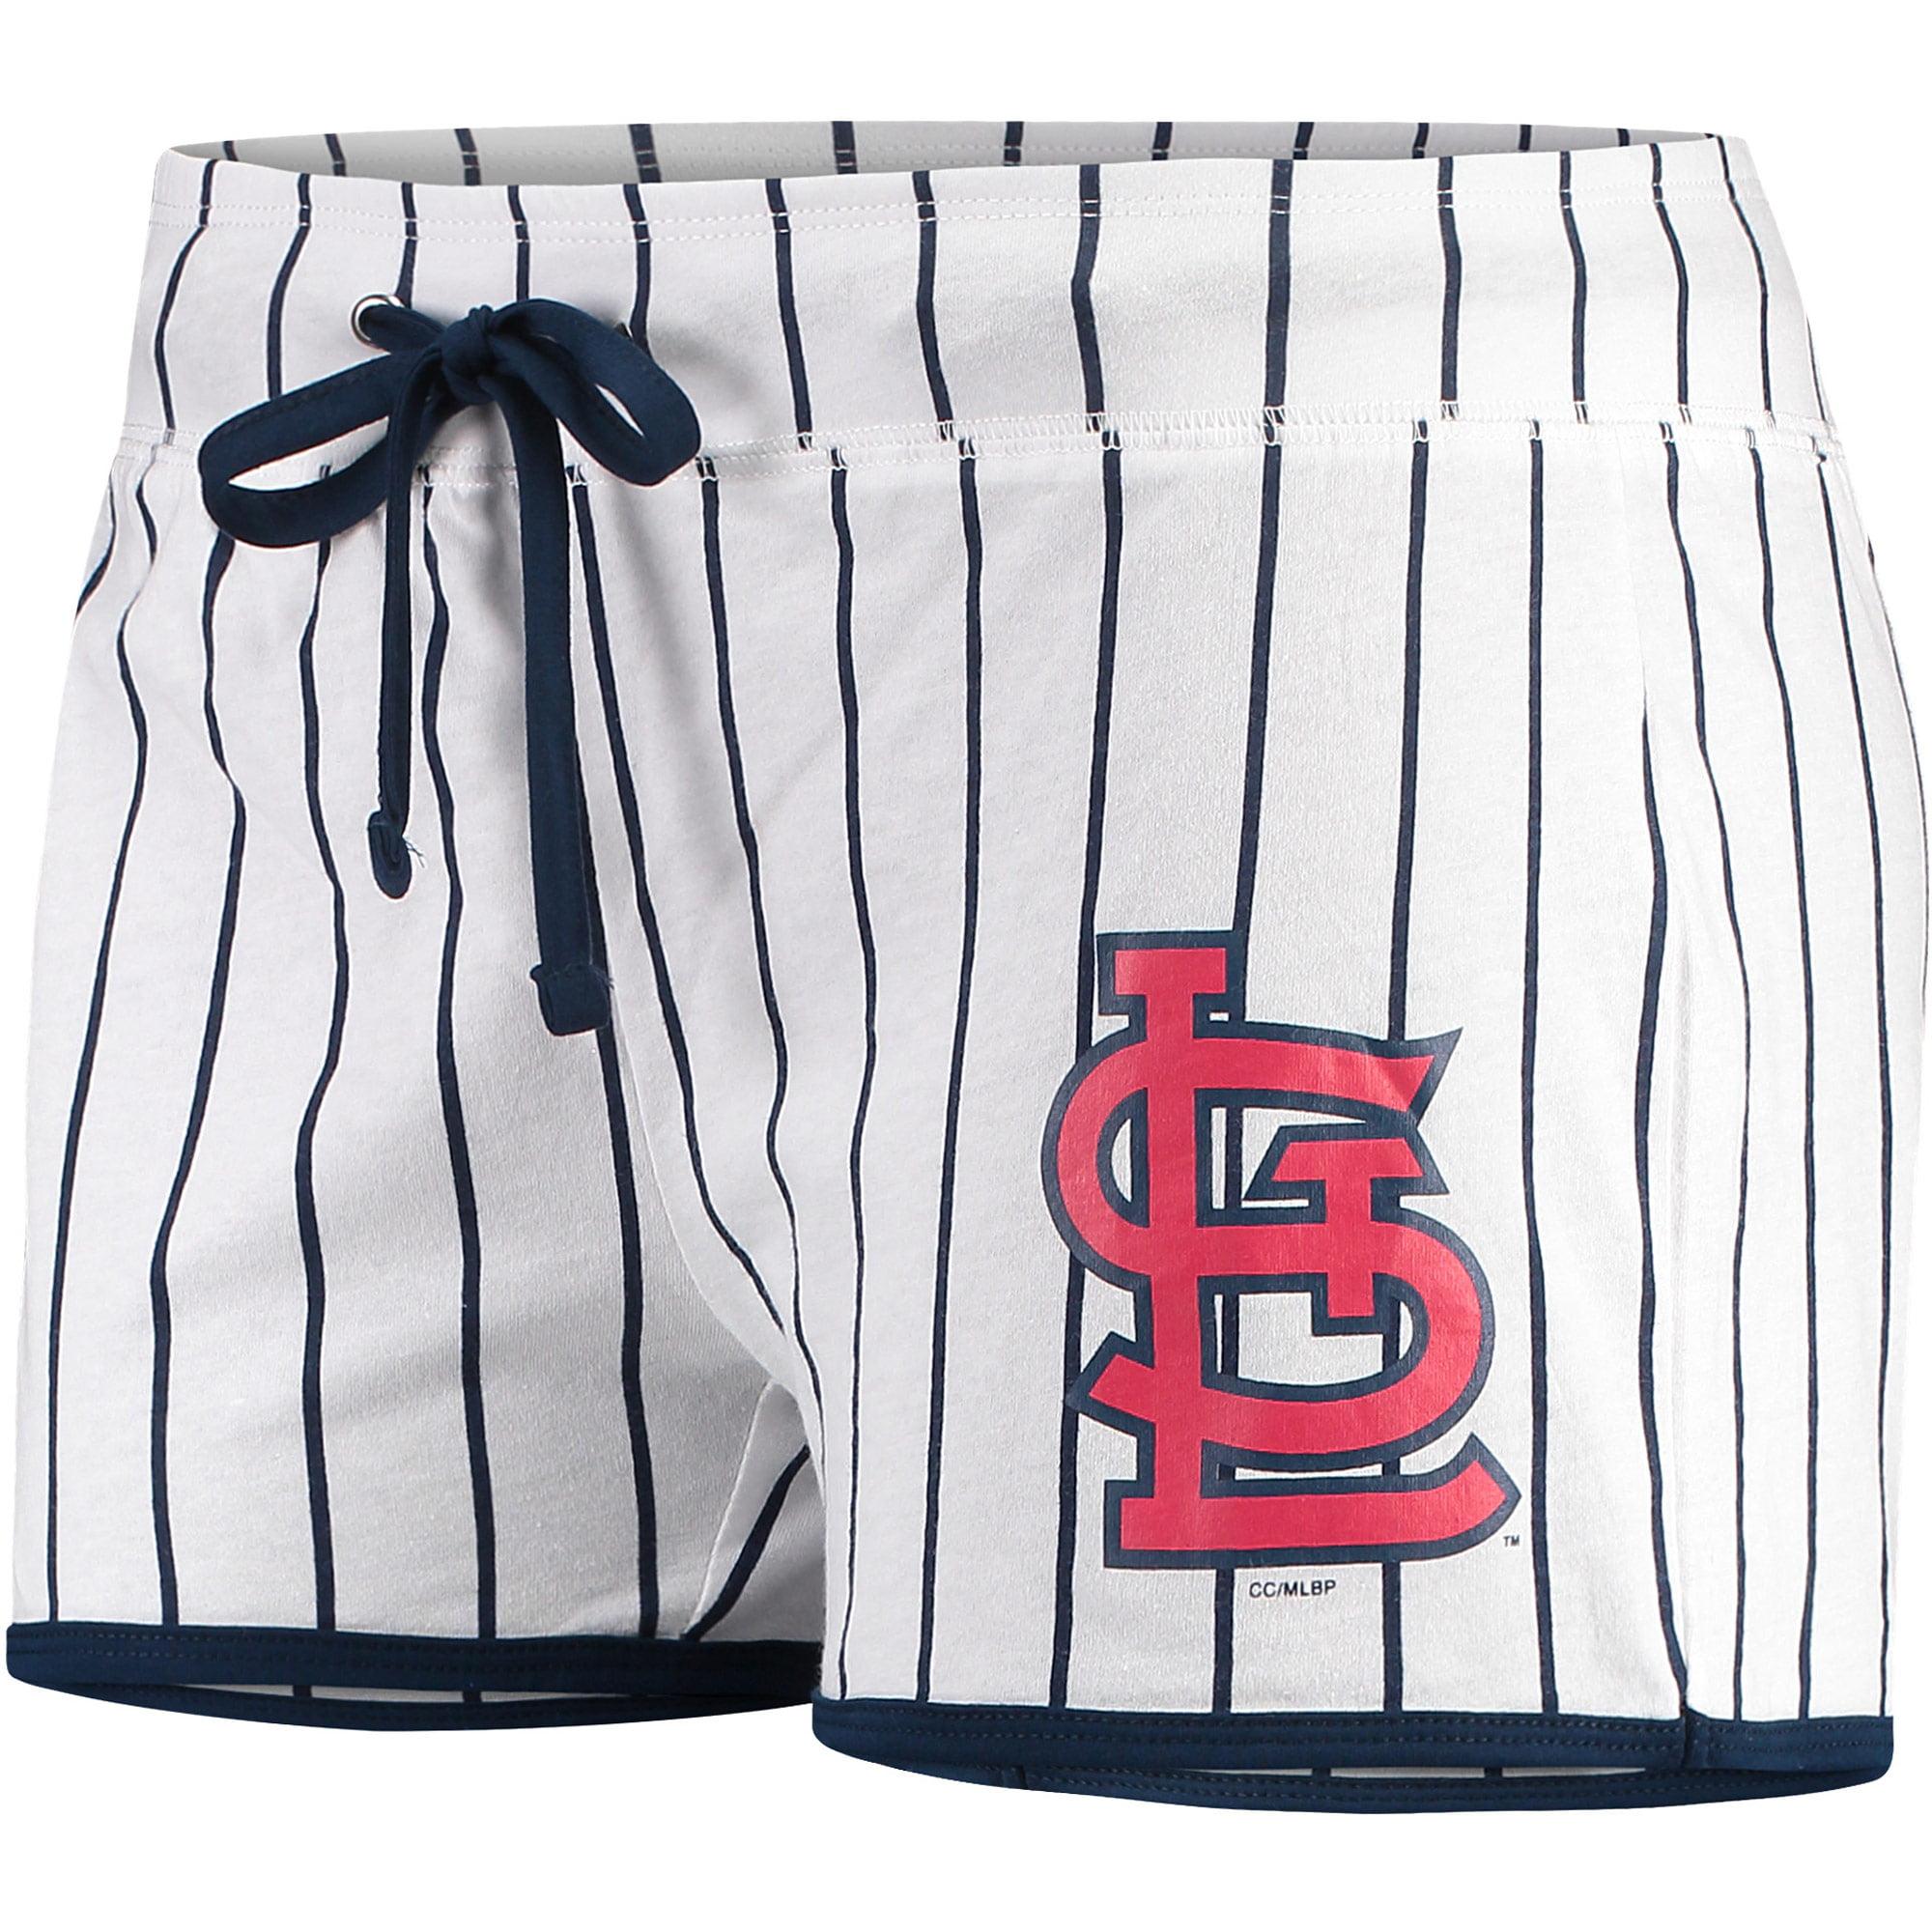 St. Louis Cardinals Concepts Sport Women's Vigor Sleep Shorts - White/Navy